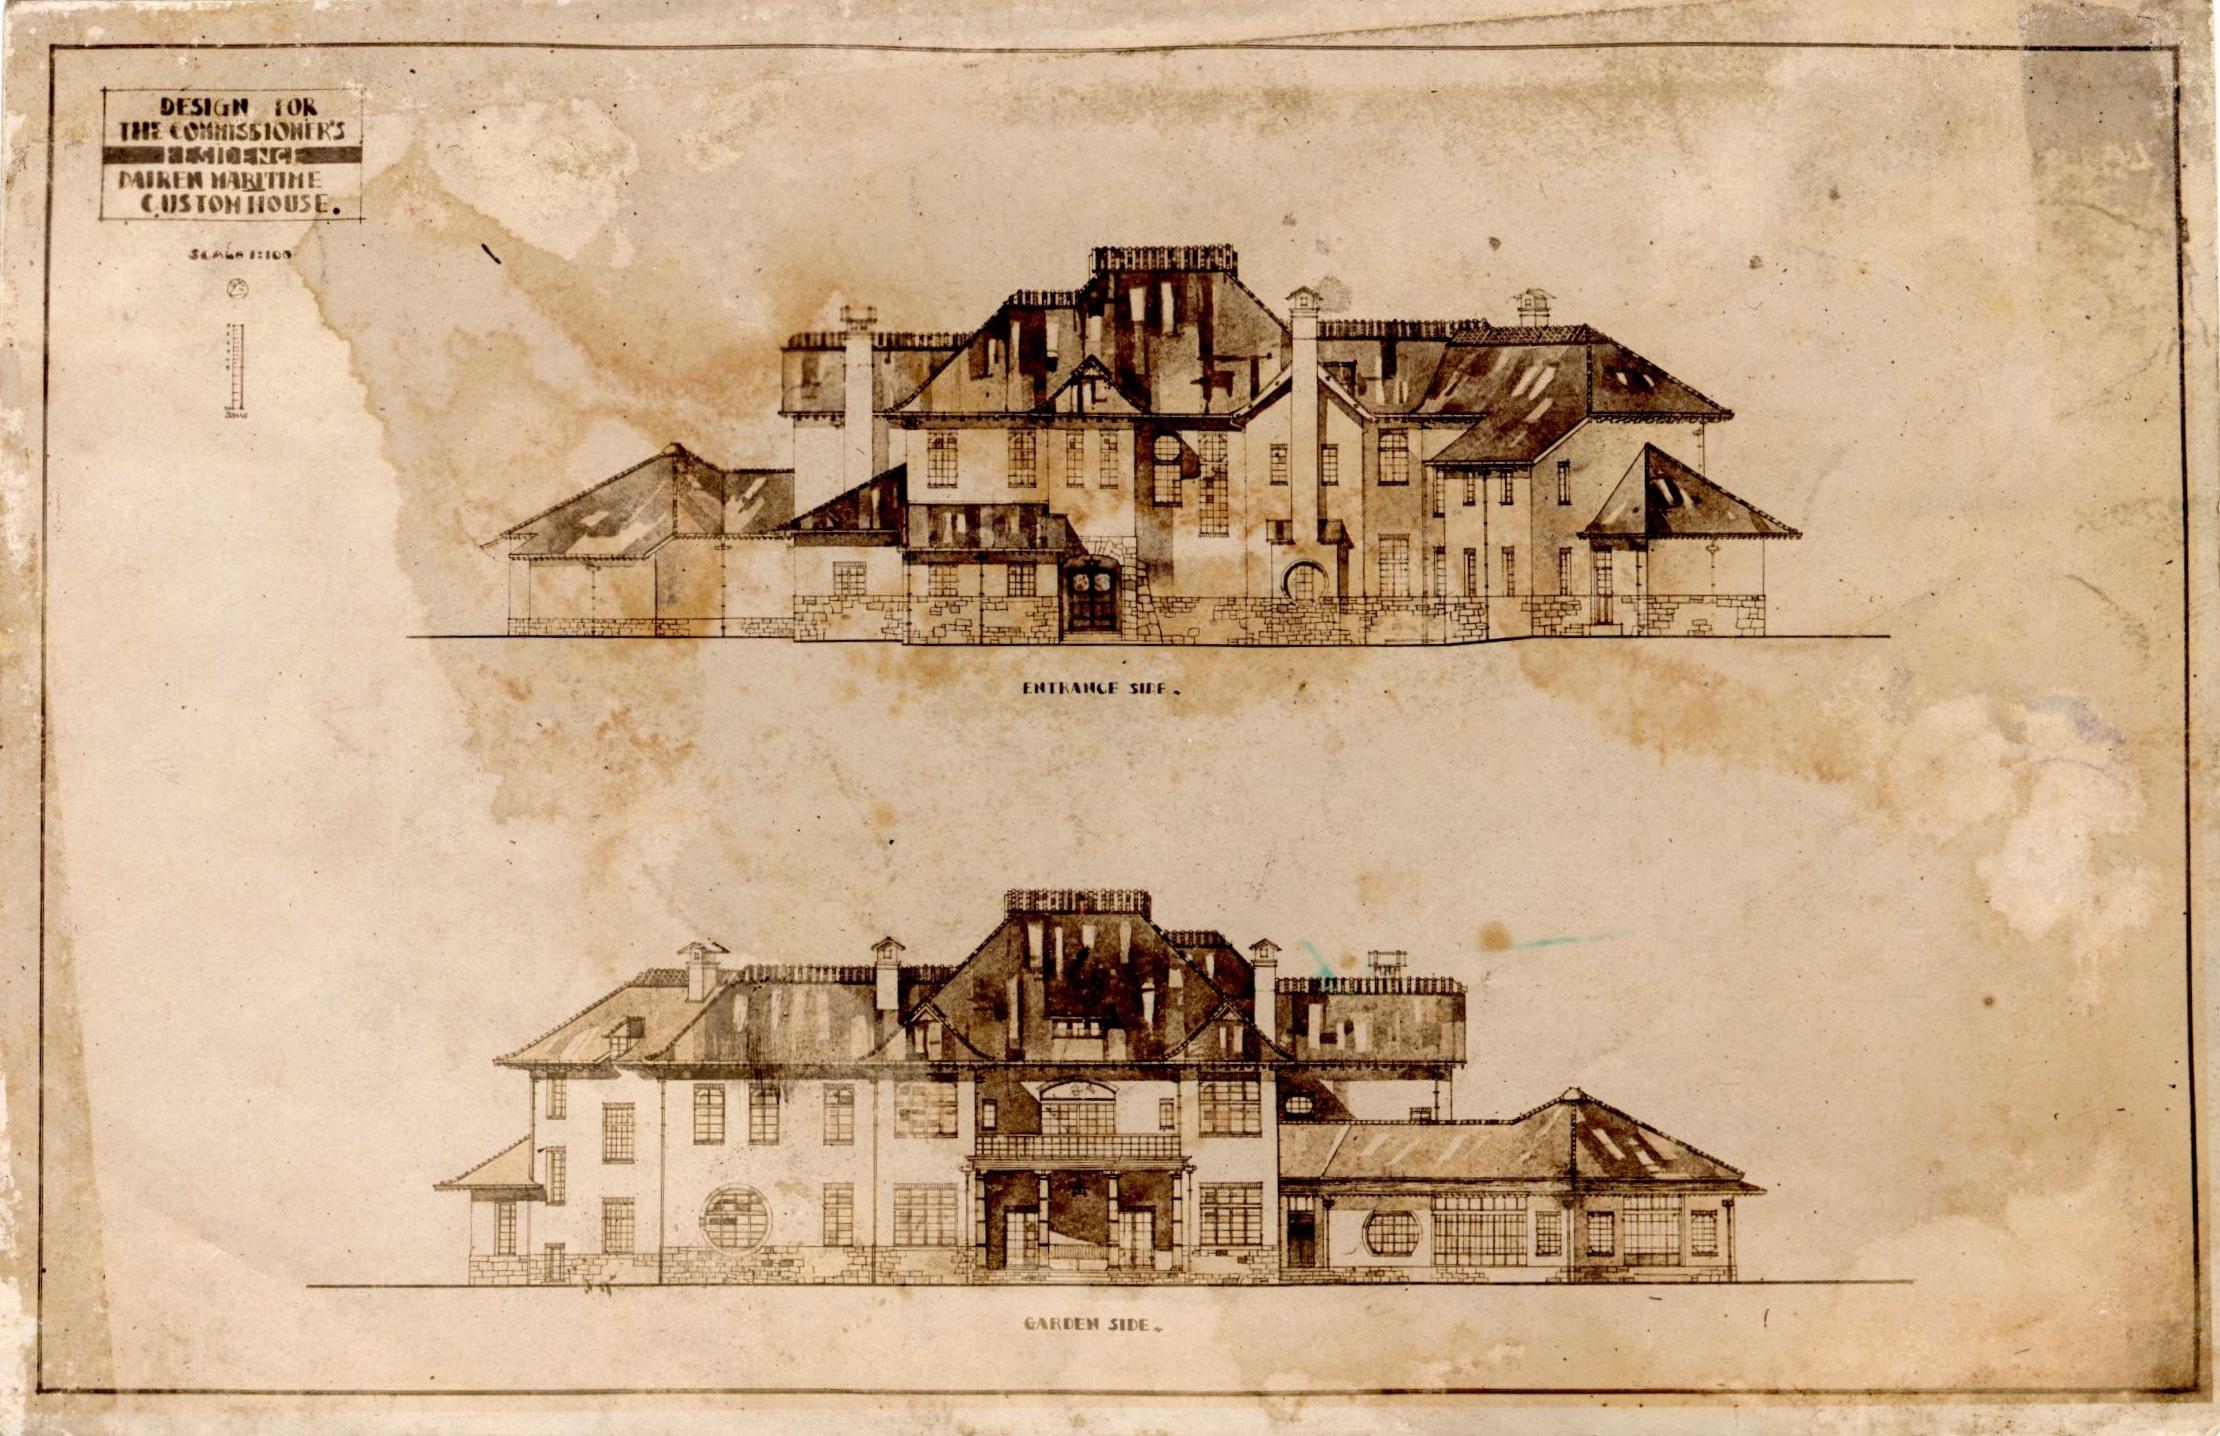 Sketch of Dalian Customs House